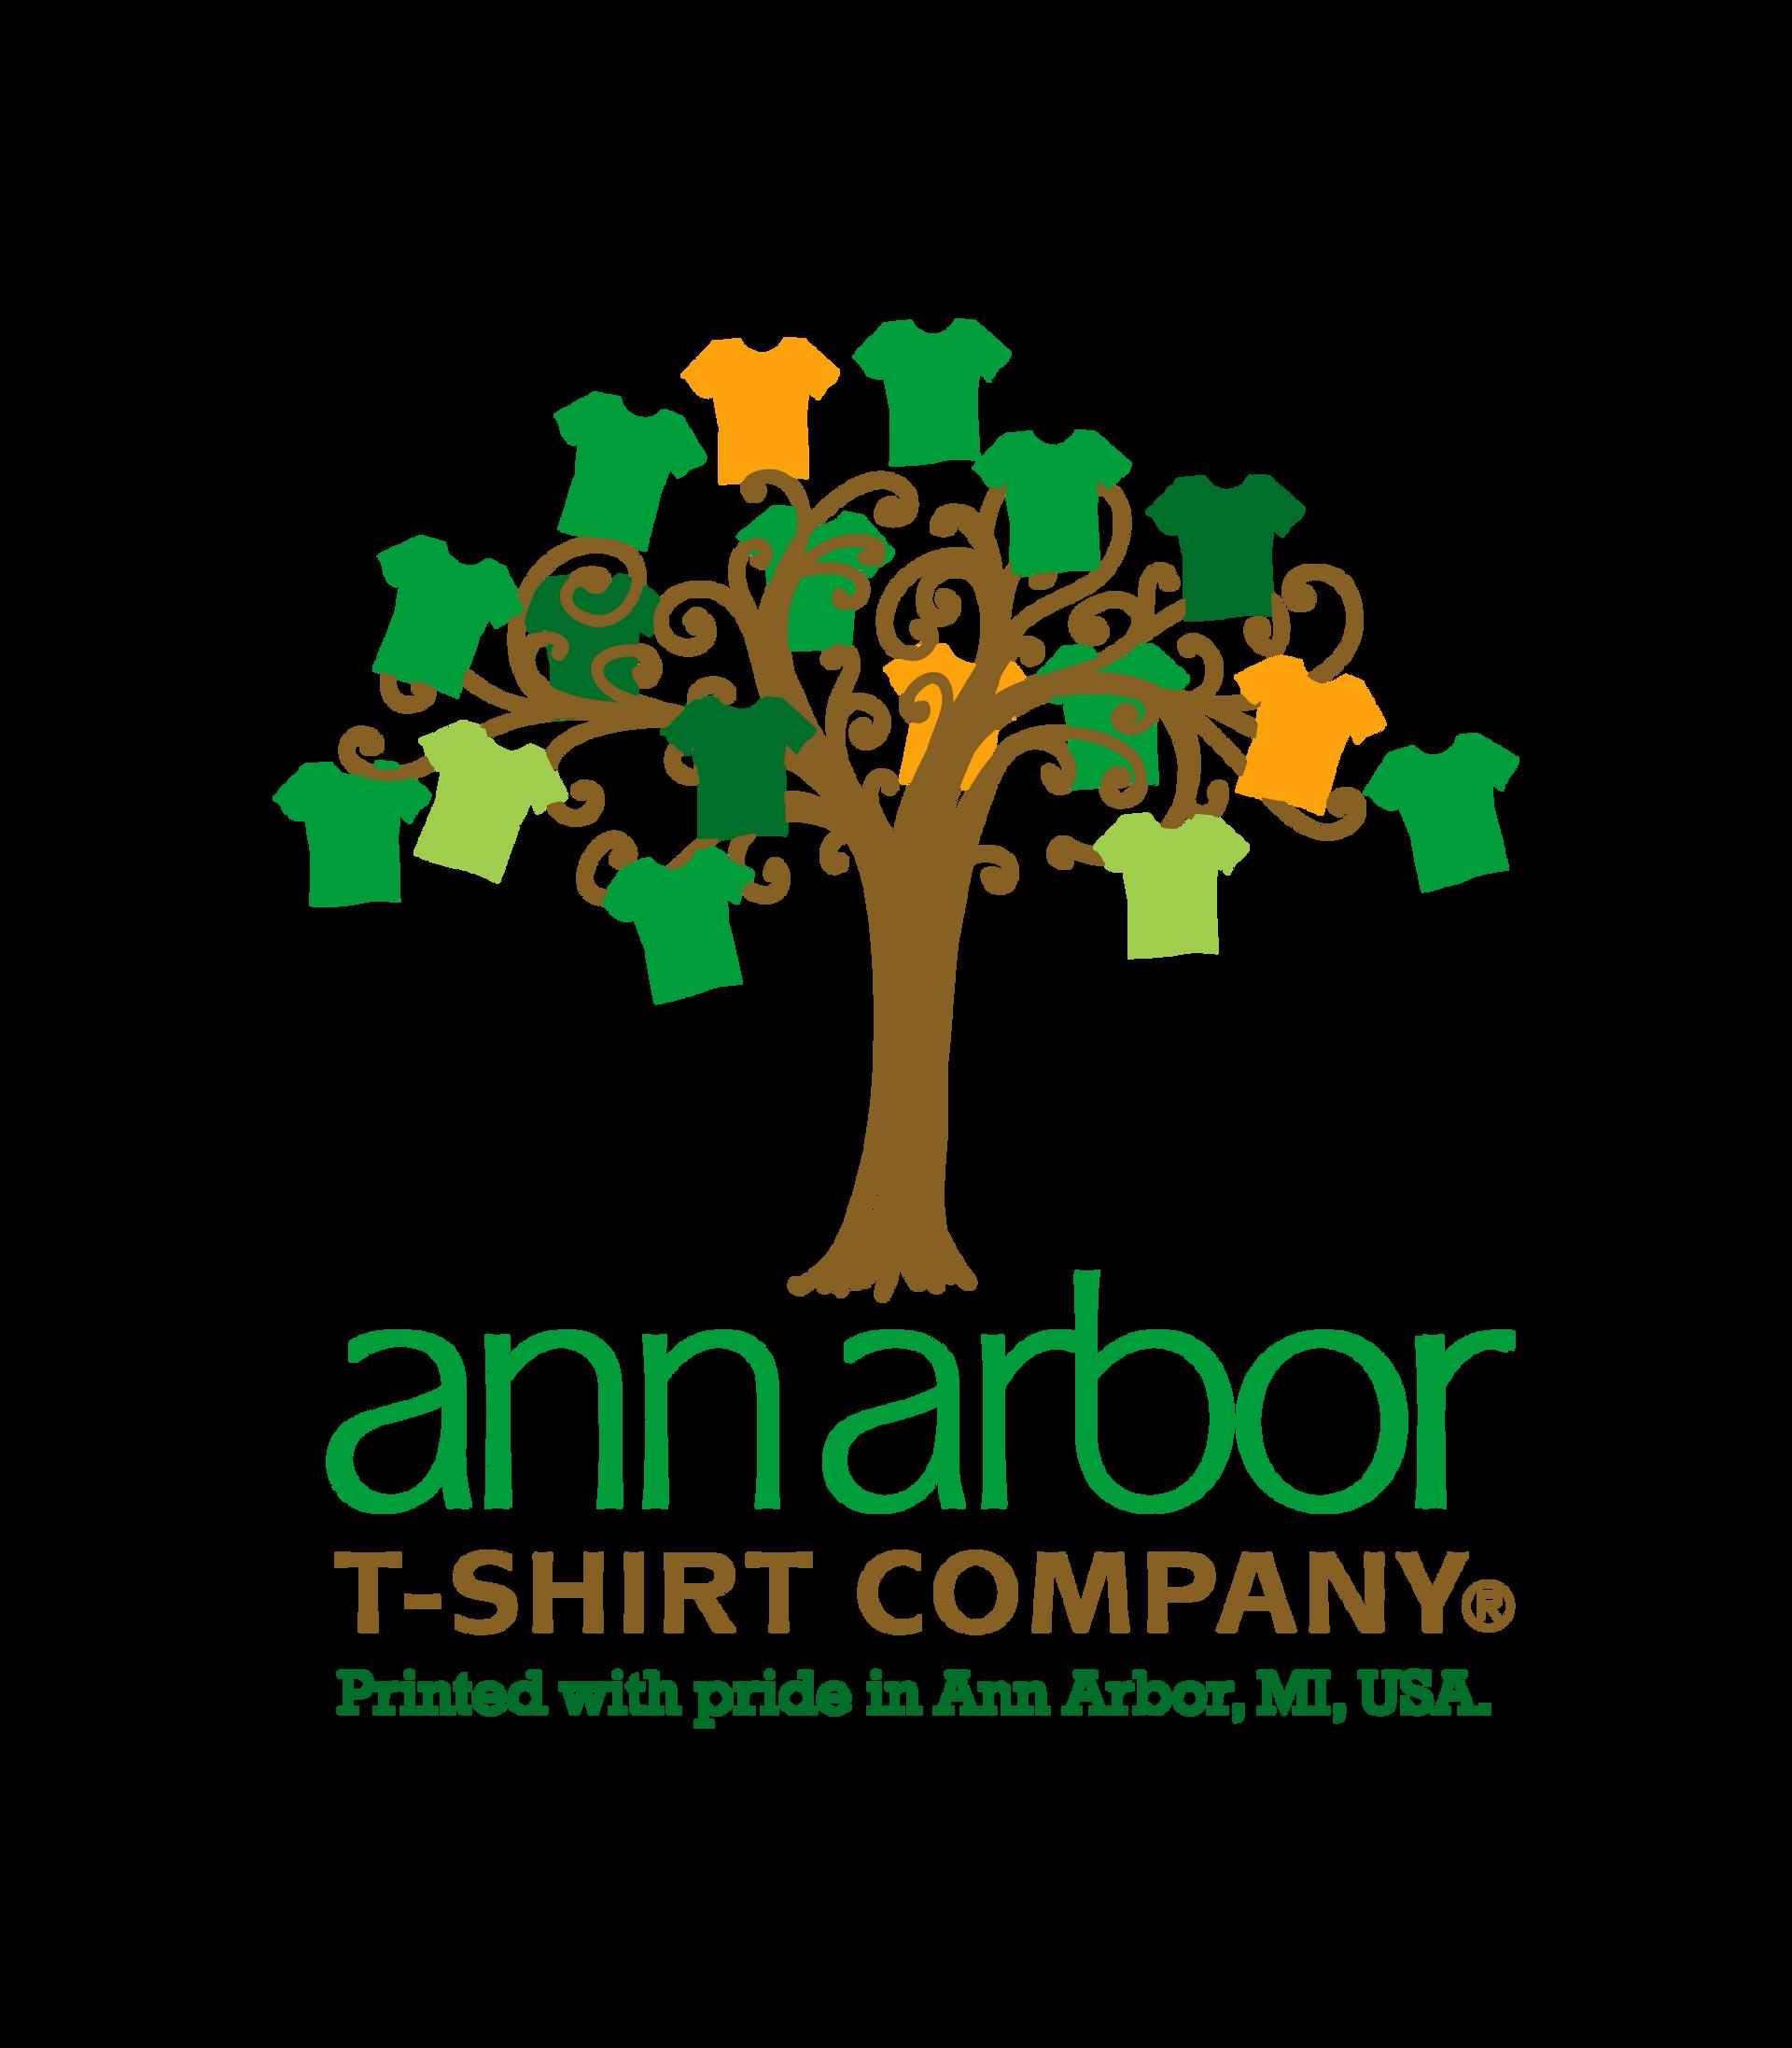 Ann Arbor TShirt Co logo.png